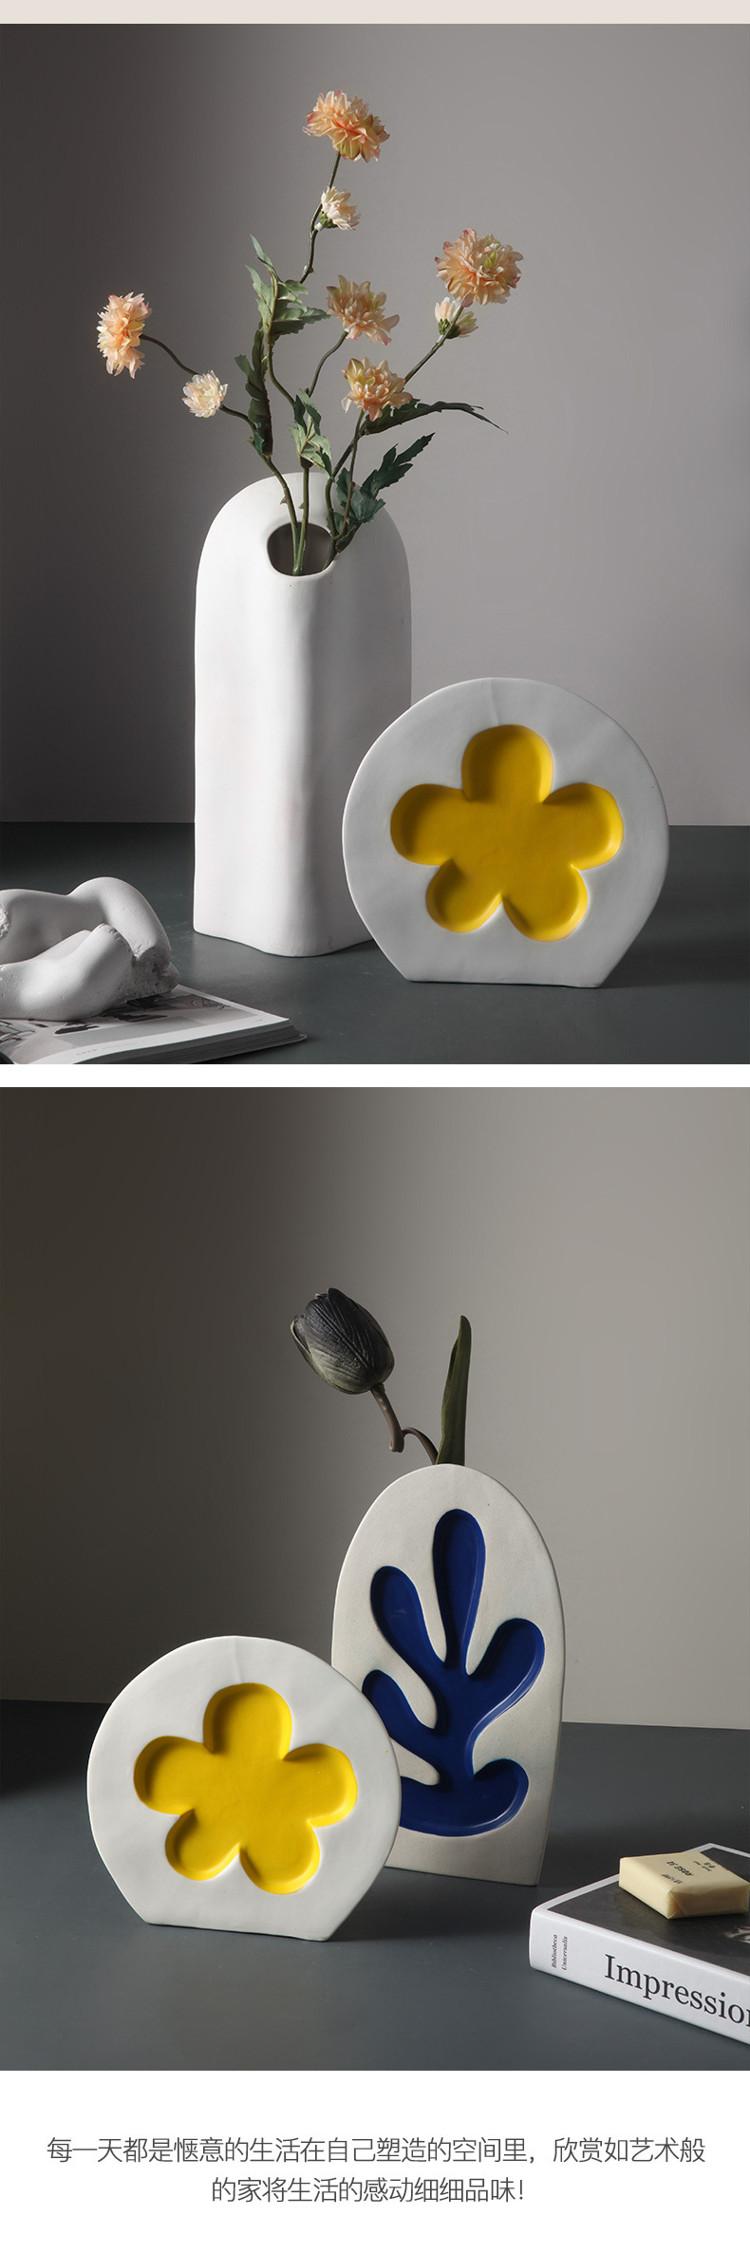 1JC21080 Instagram Vase New Trend Online Sale (14)